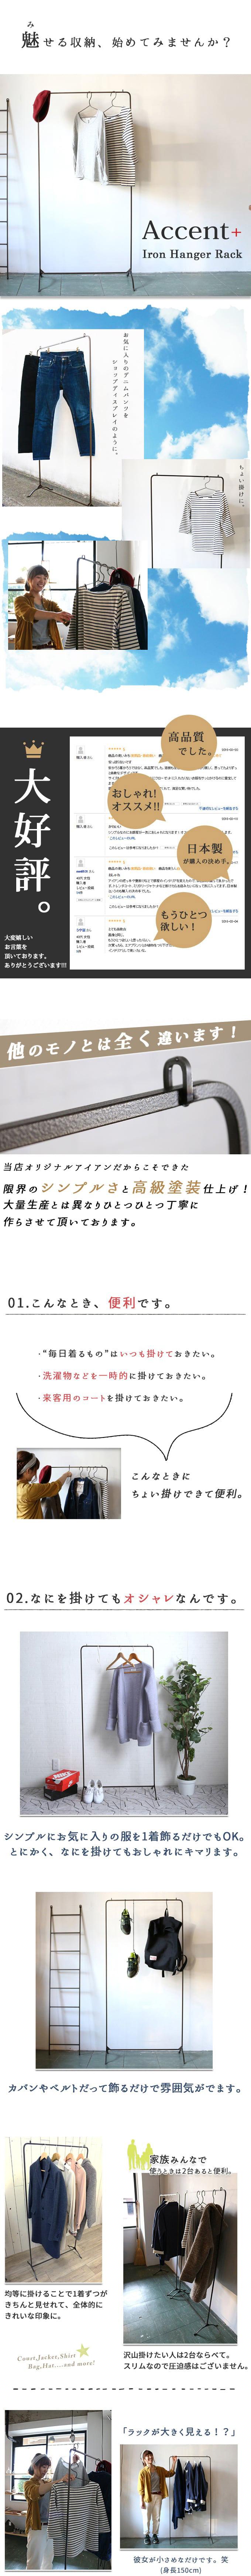 ��Accent+����������ϥ���å��� �����ȥϥ� / 1